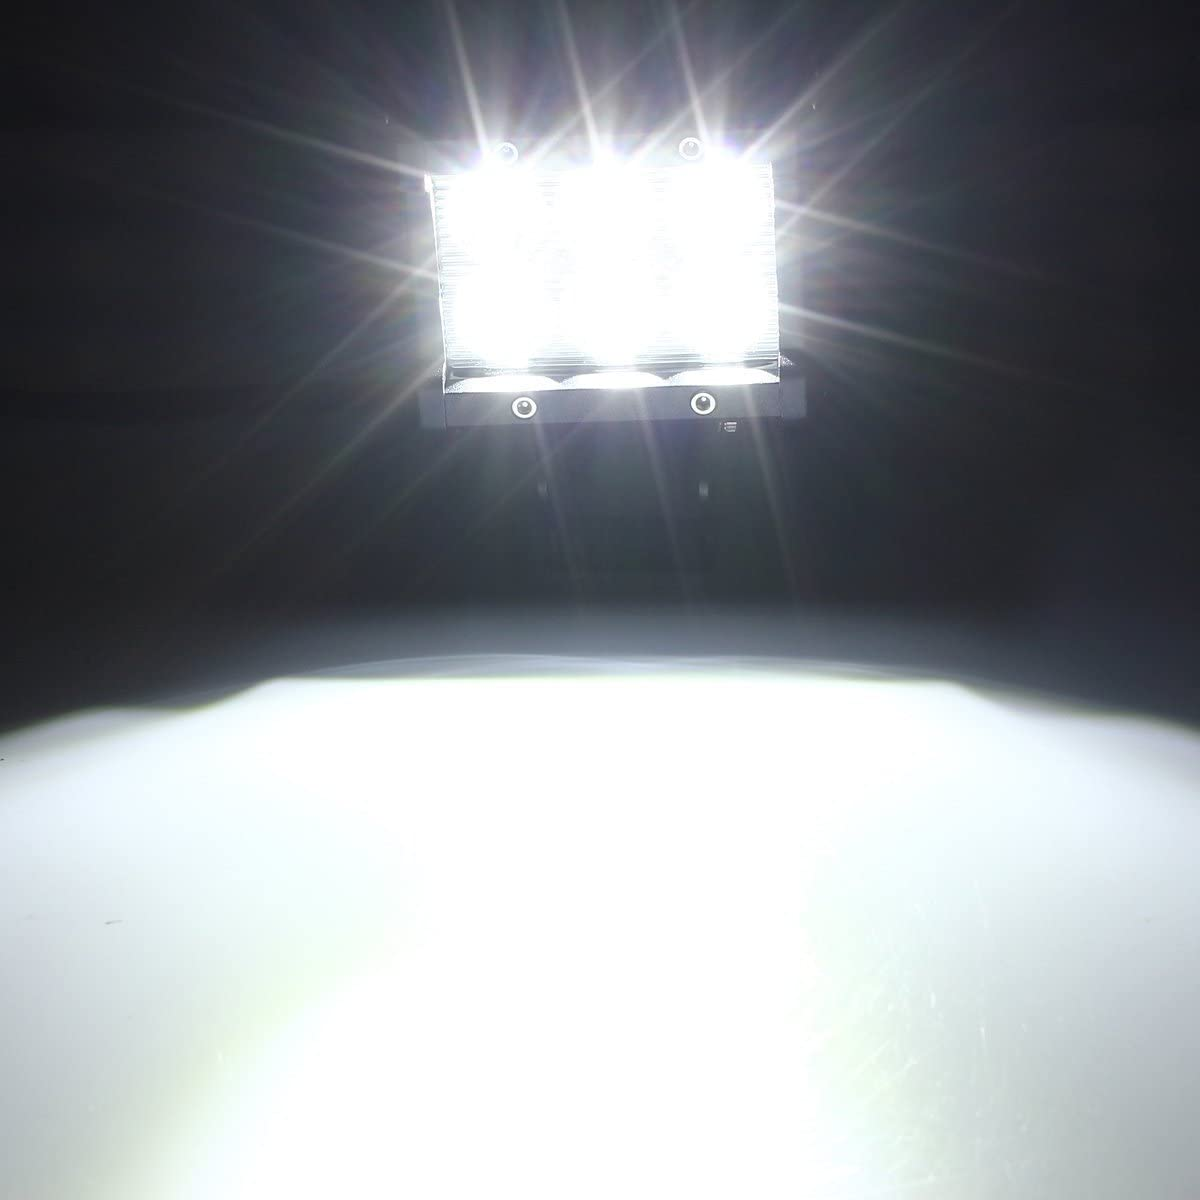 LARS360 4x 18W LED Work Light Offroad Flood Light LED Bar 12-24V Square Reflector Headlight Working Headlamps Offroad Reversing Lamp For Automotive SUV UTV ATV 6000-6500K Daylight White 1300LM